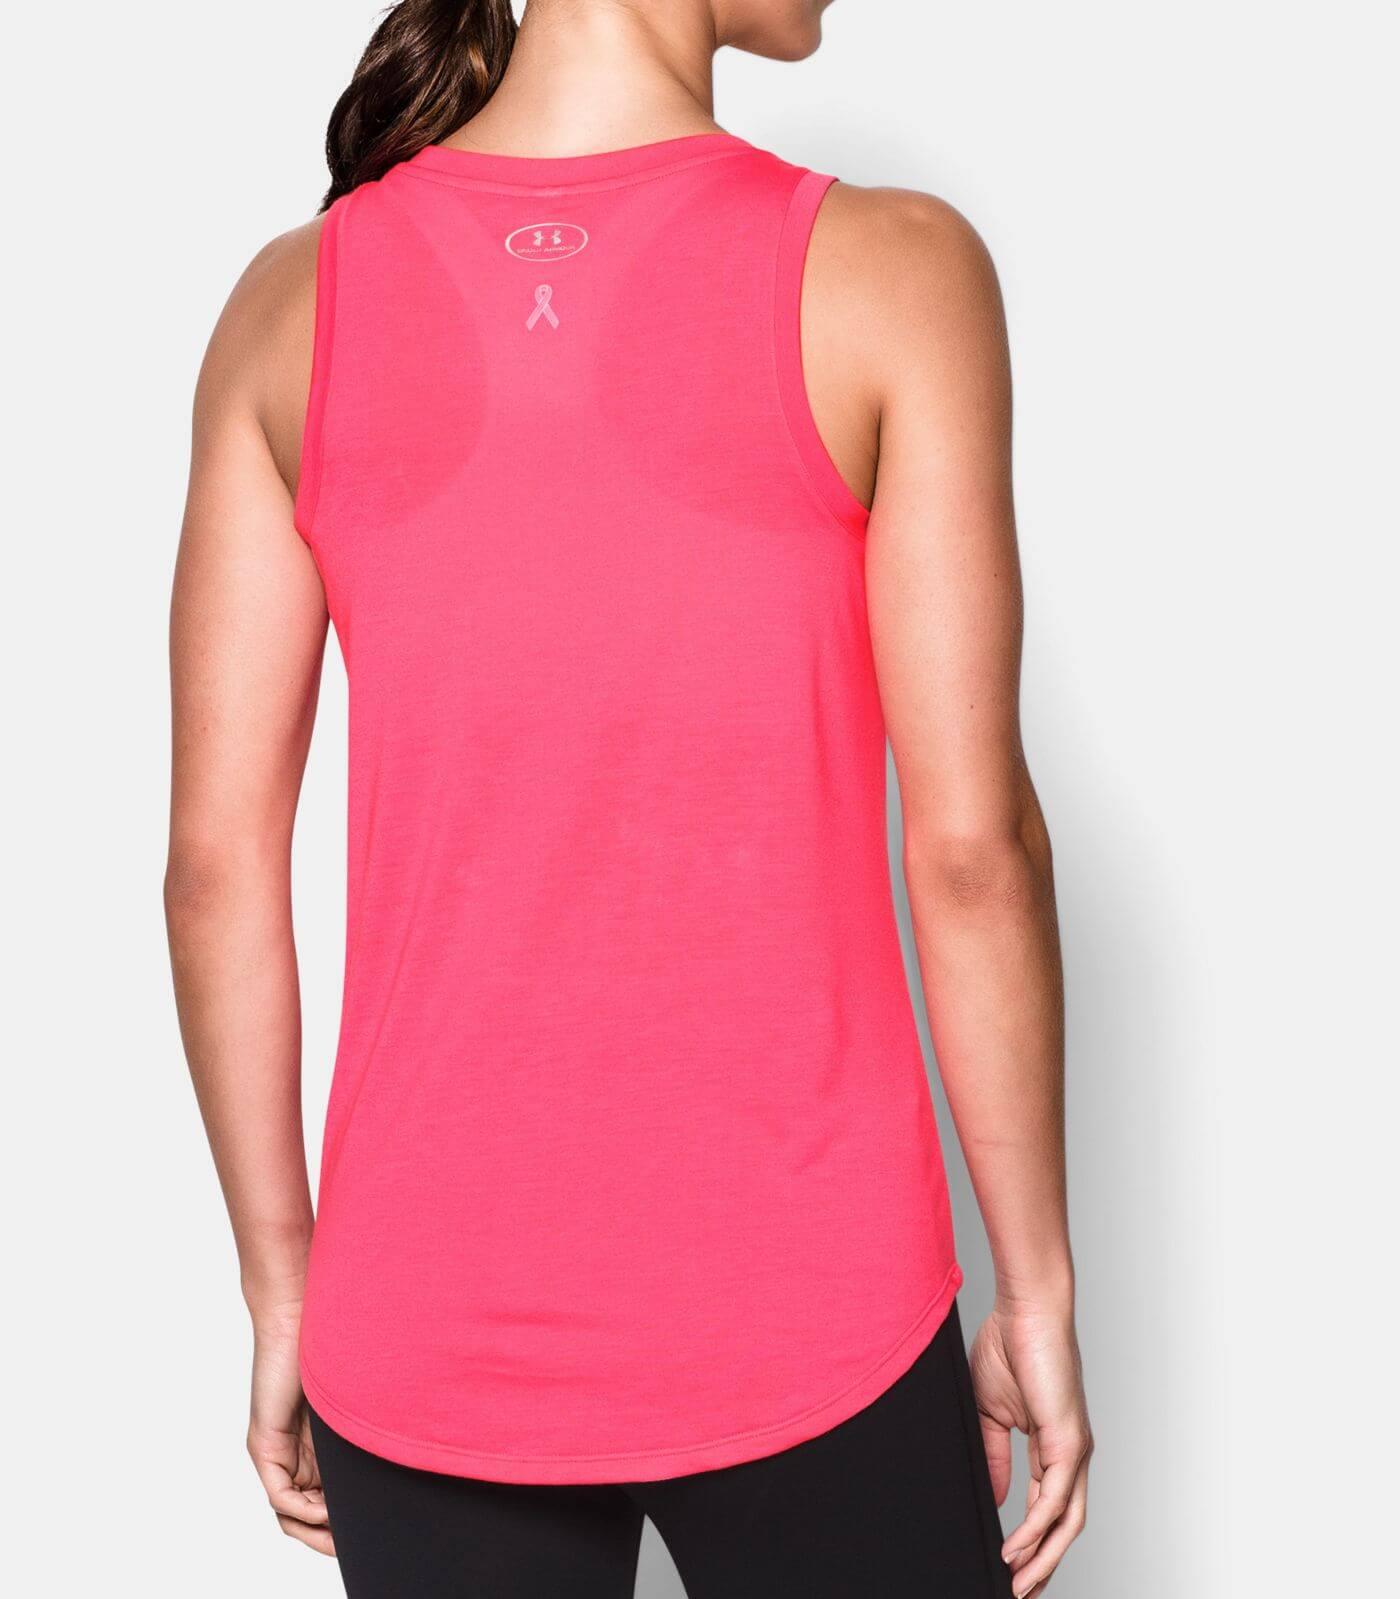 Camiseta Regata Under Armour Power In Pink Outubro Rosa